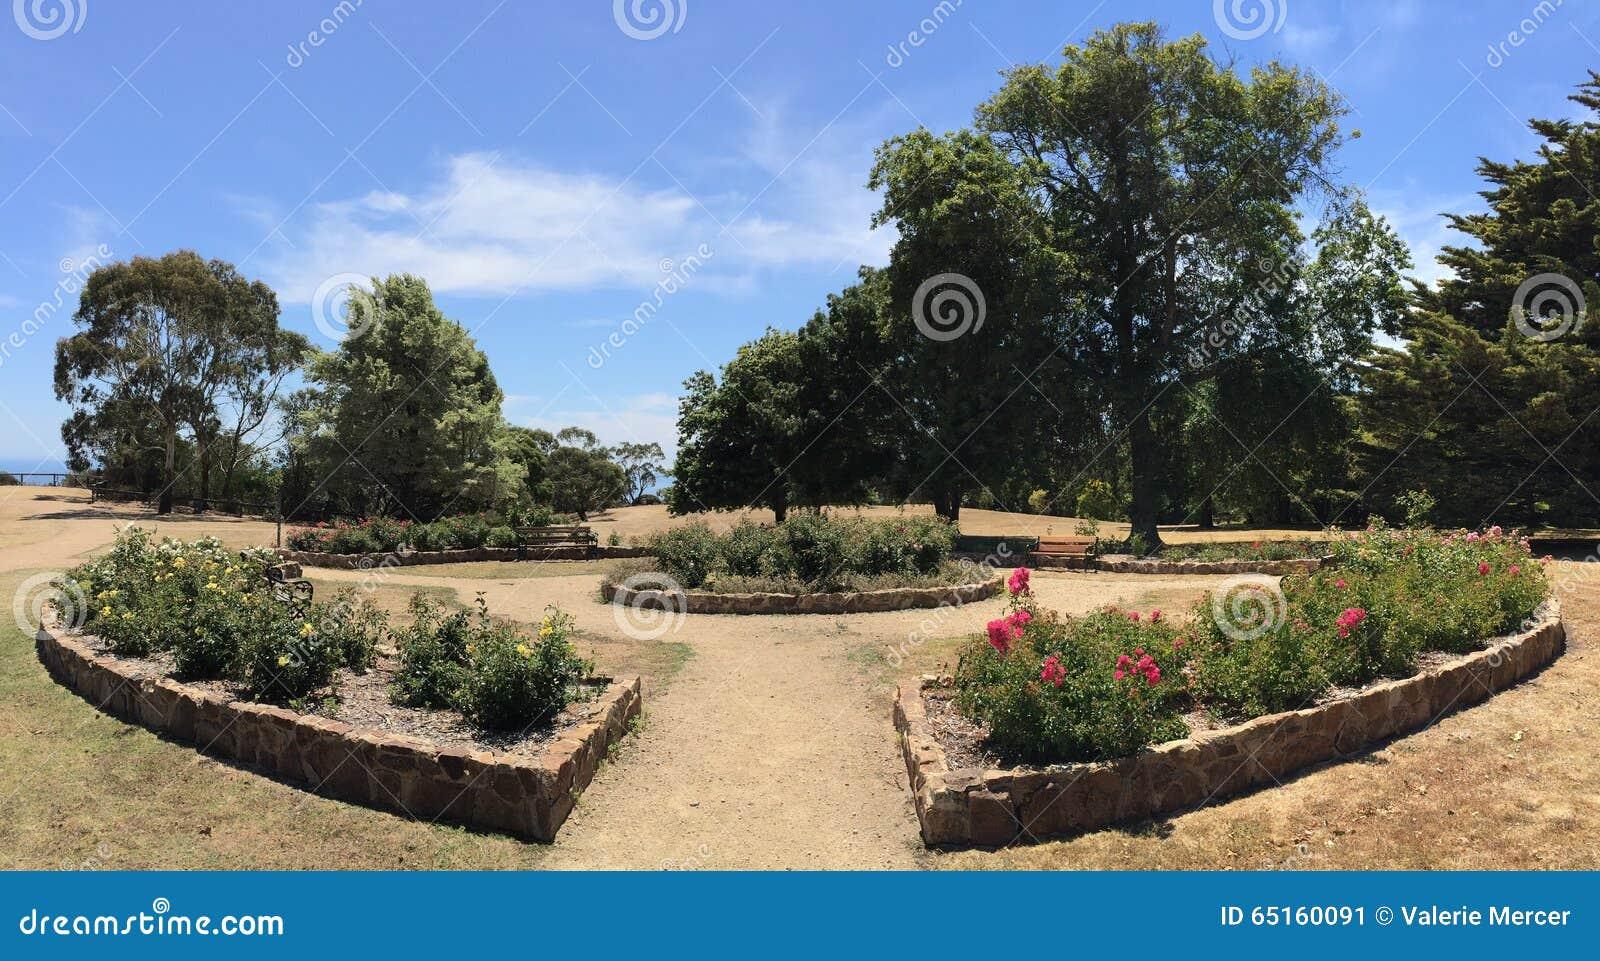 Seawinds Garden